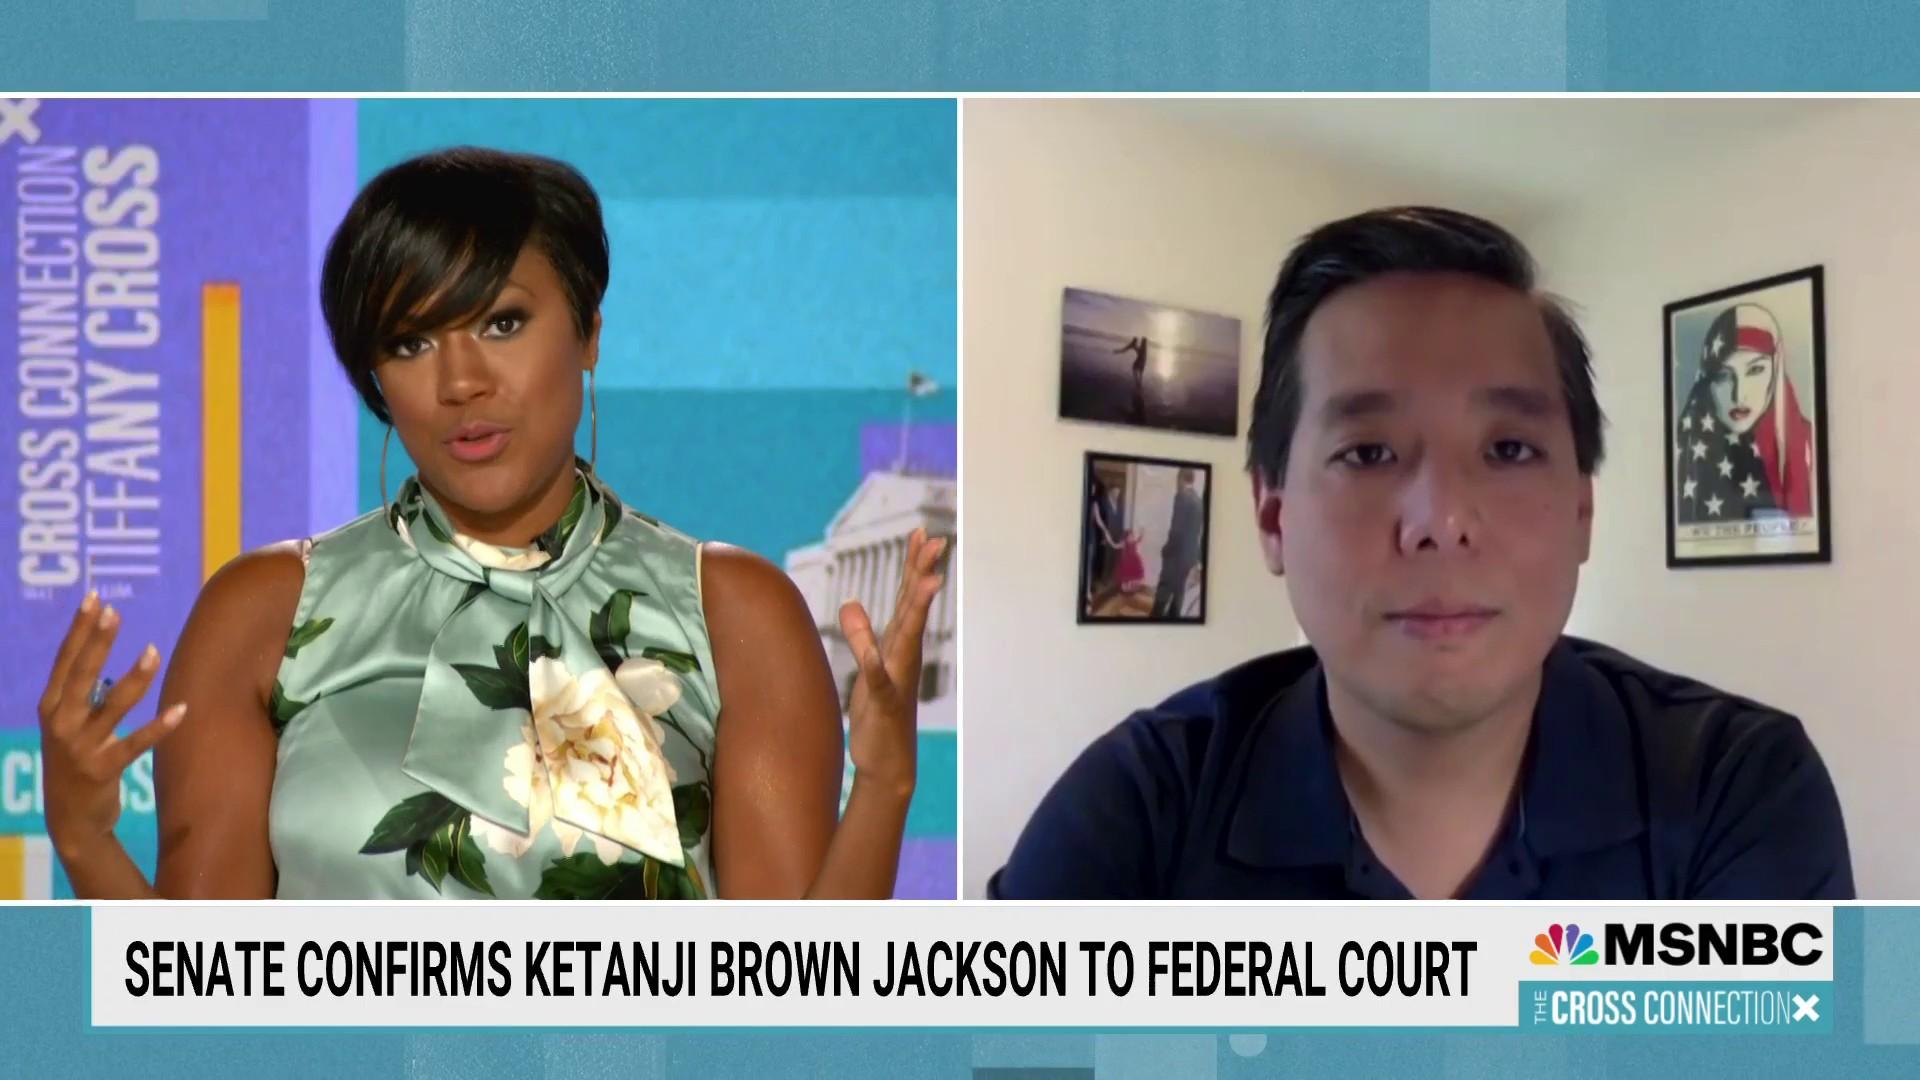 Senate confirms potential Biden SCOTUS short-lister Ketanji Brown Jackson to influential D.C. Circuit